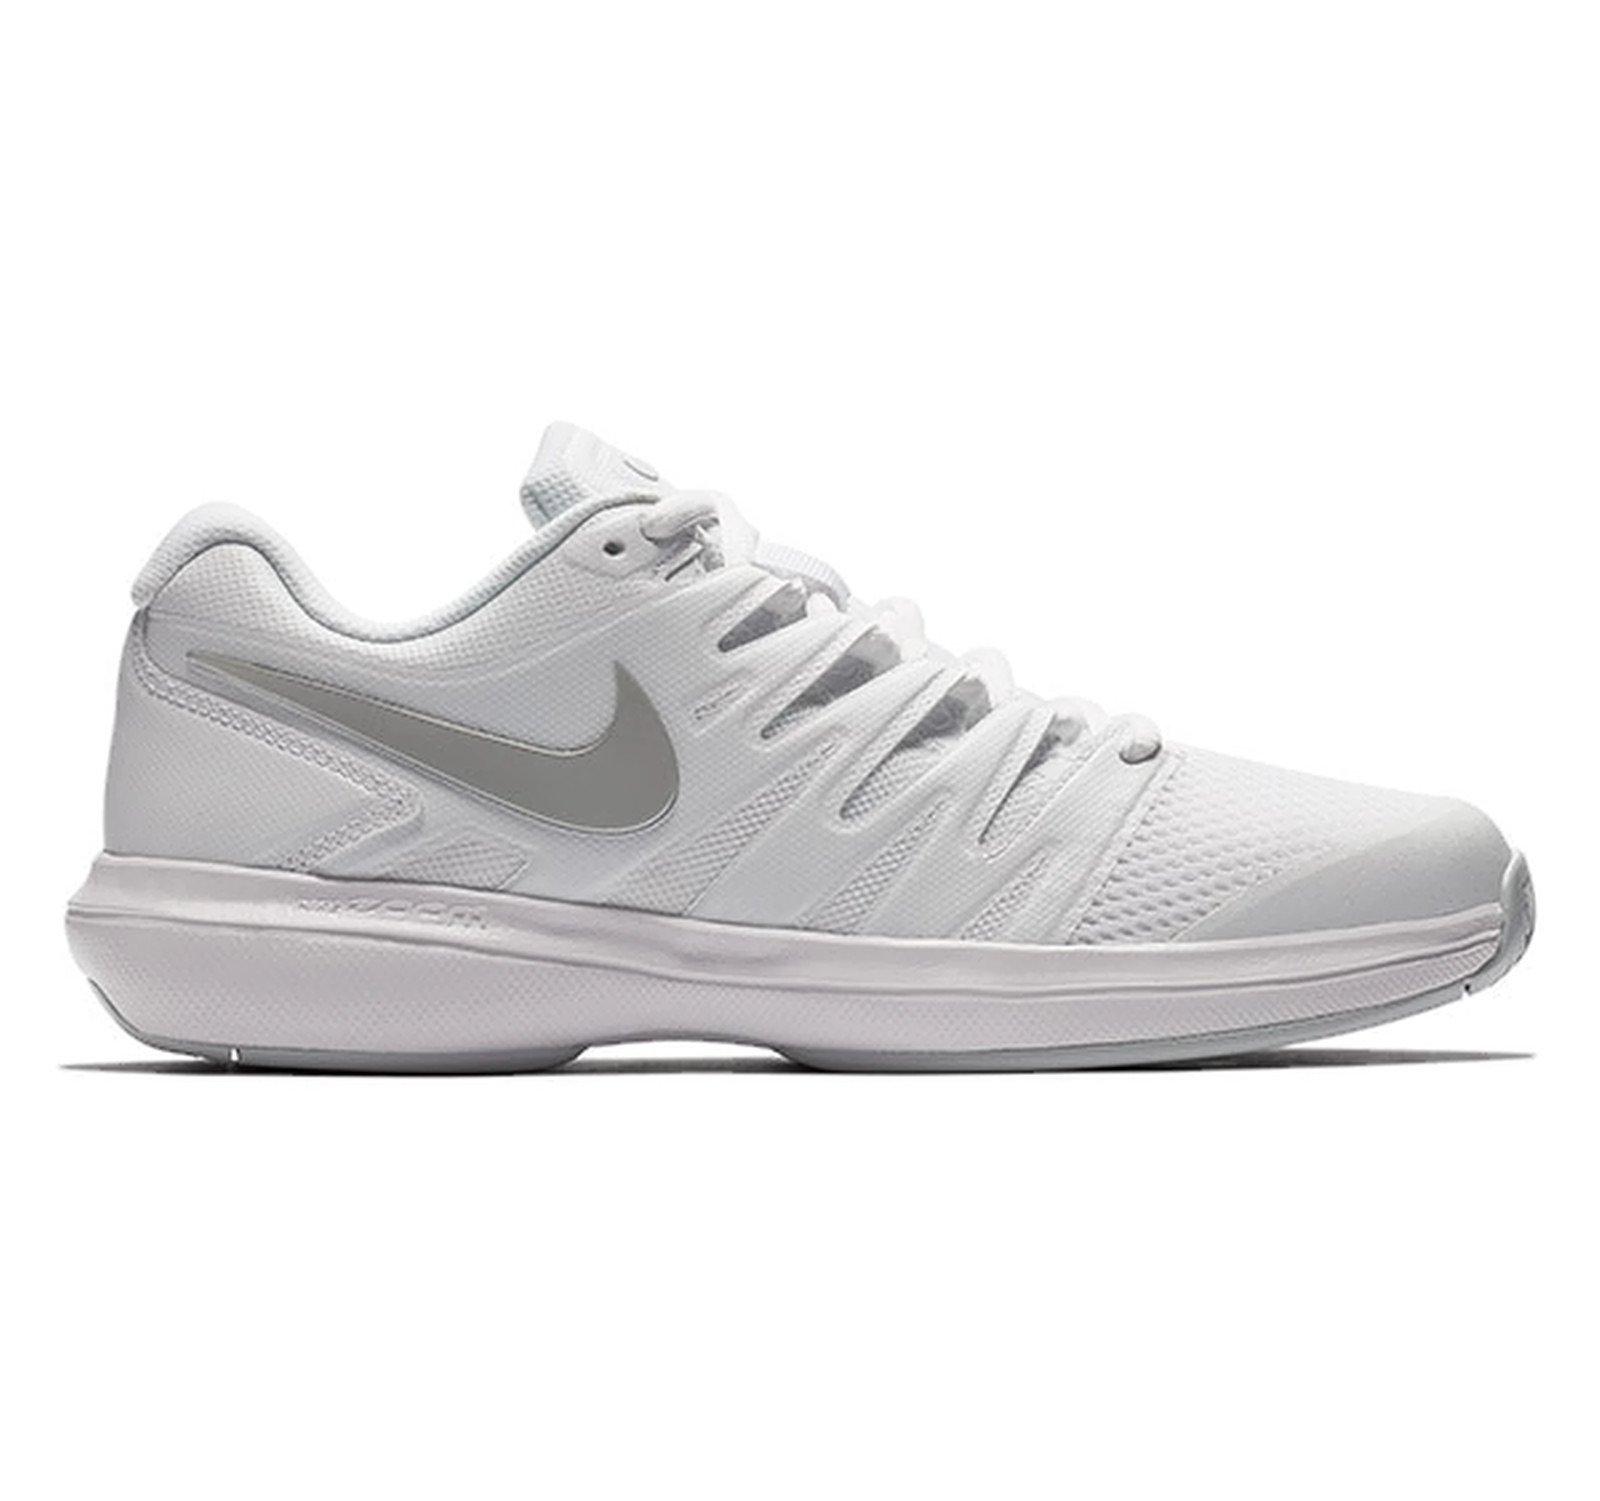 6cd3dae7f286 Galleon - Nike Women s Air Zoom Prestige Tennis Shoe White Metallic  Silver Pure Platinum Size 7.5 M US